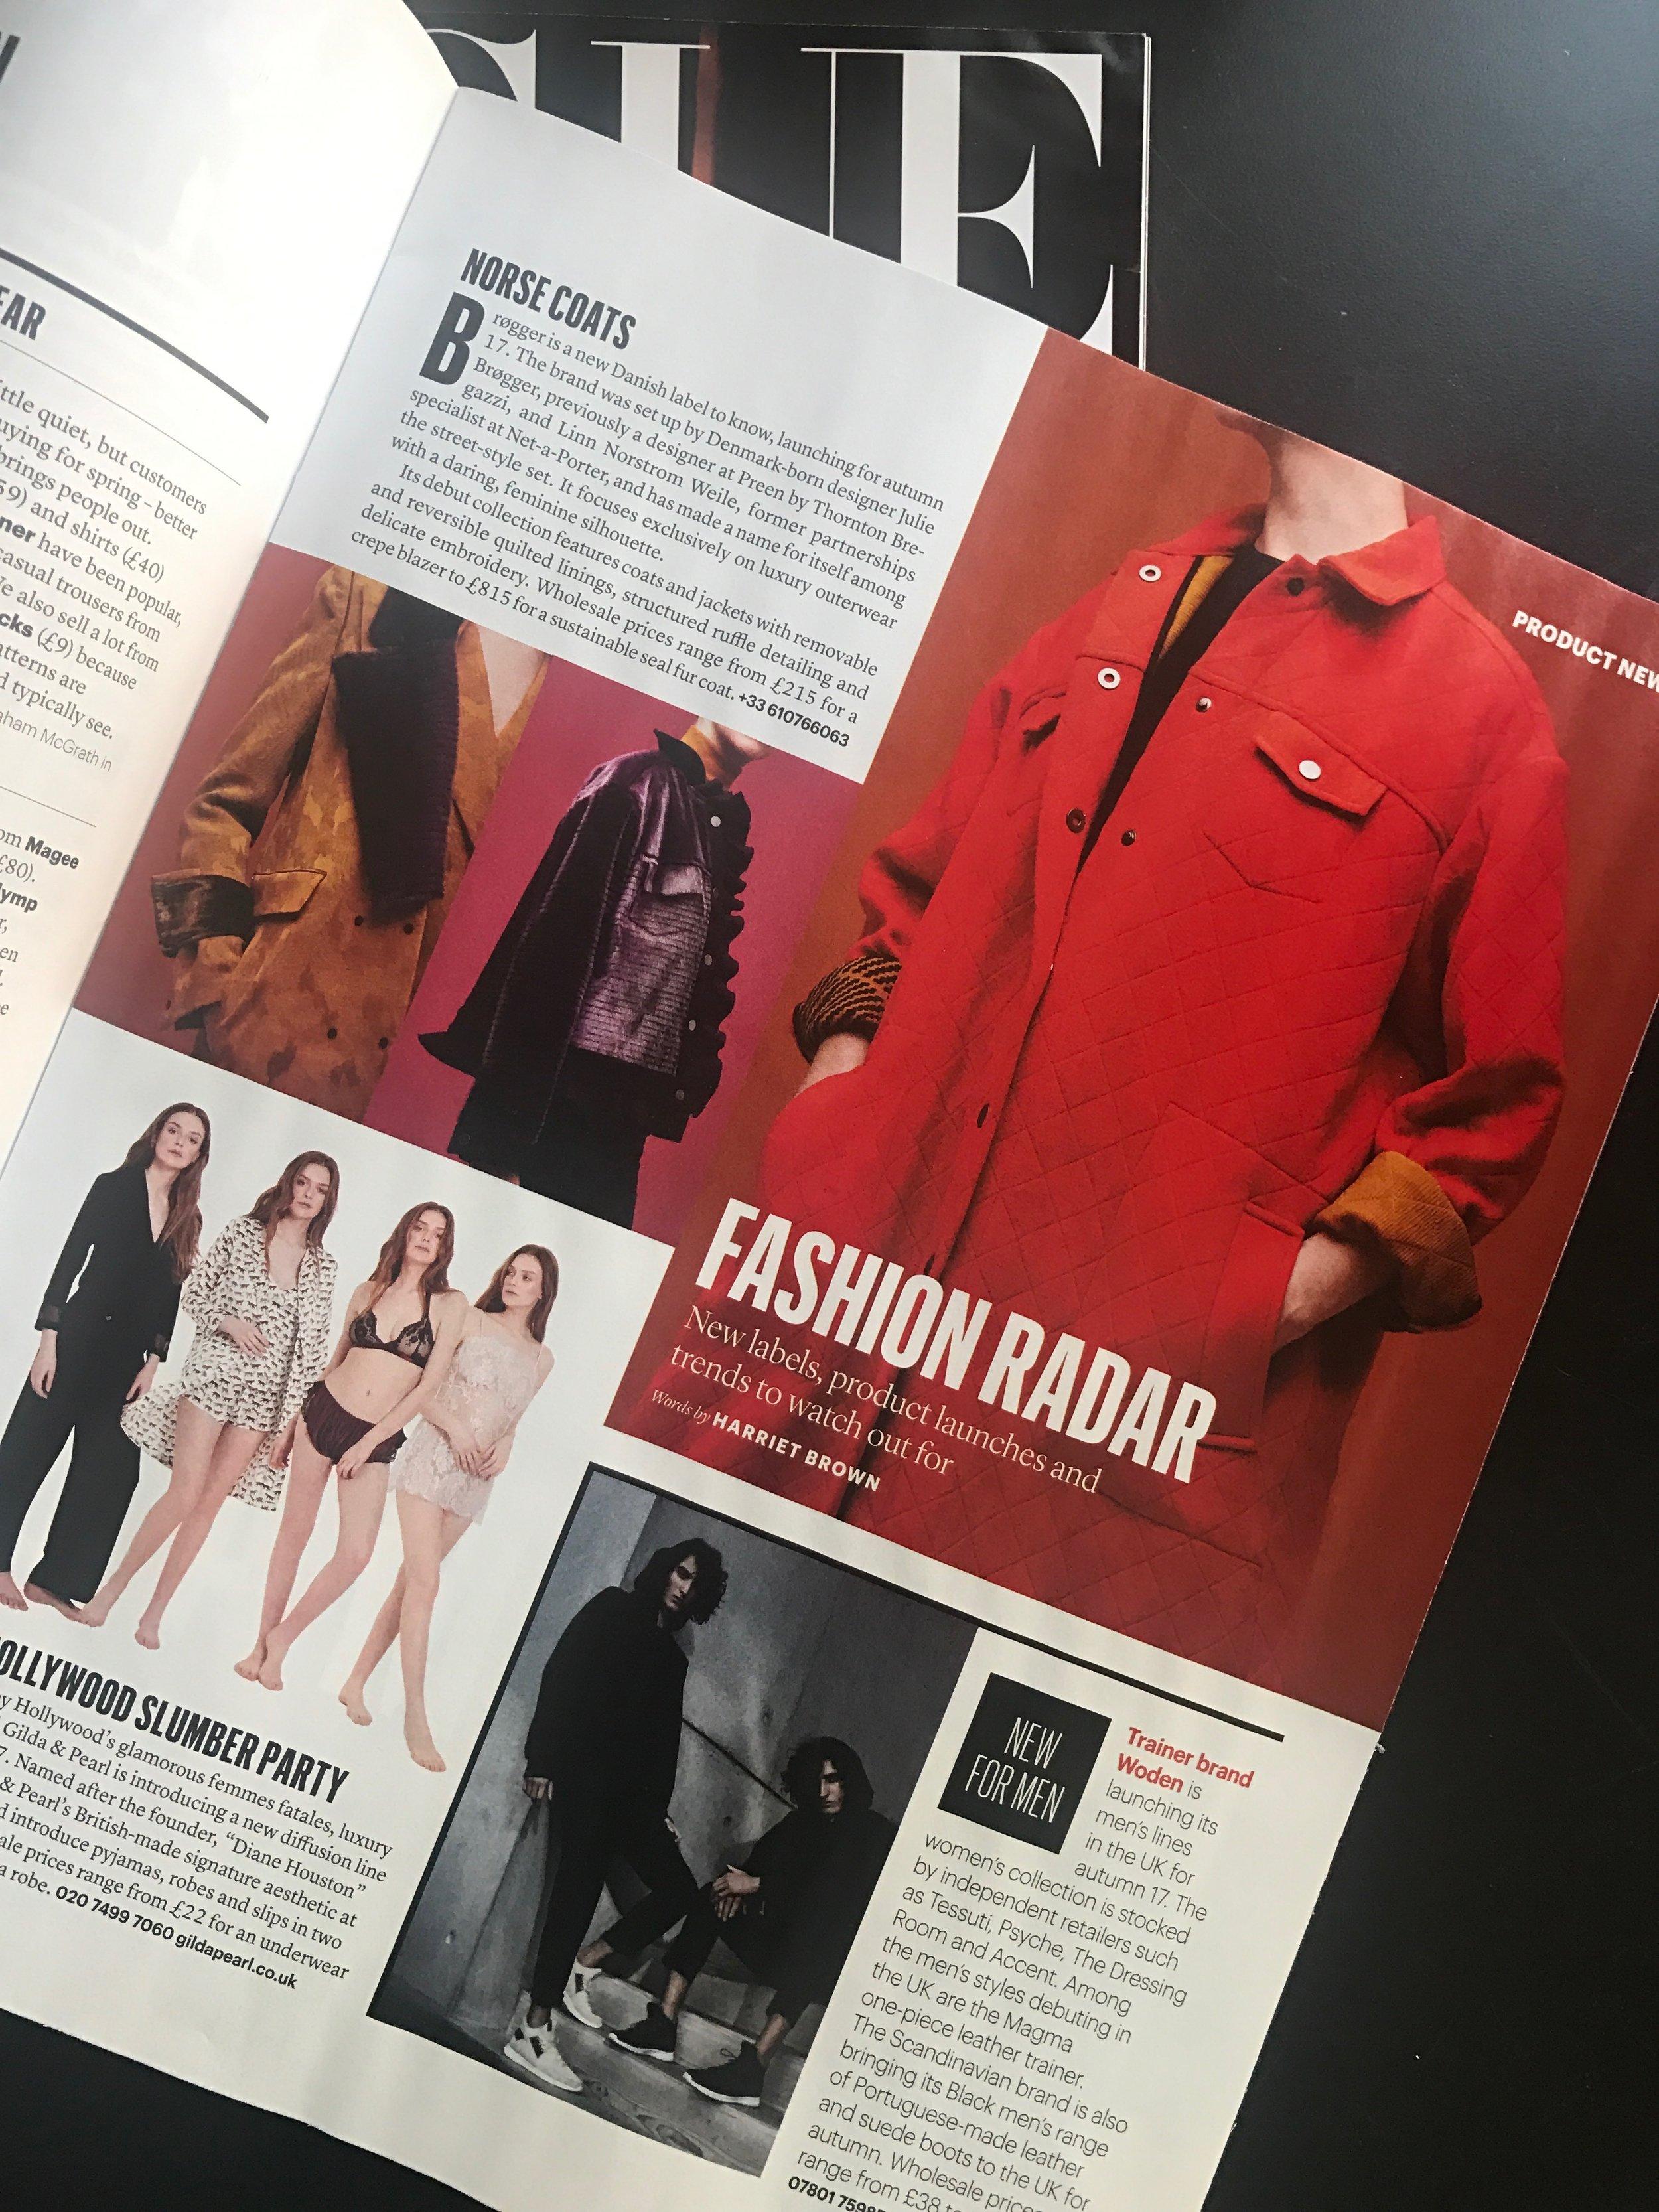 Draper's   (April 2017) Scandi-luxe outerwear launches by Brøgger     https://www.drapersonline.com/product-and-trade-shows/scandi-luxe-outerwear-launches-by-brgger/7019752.article